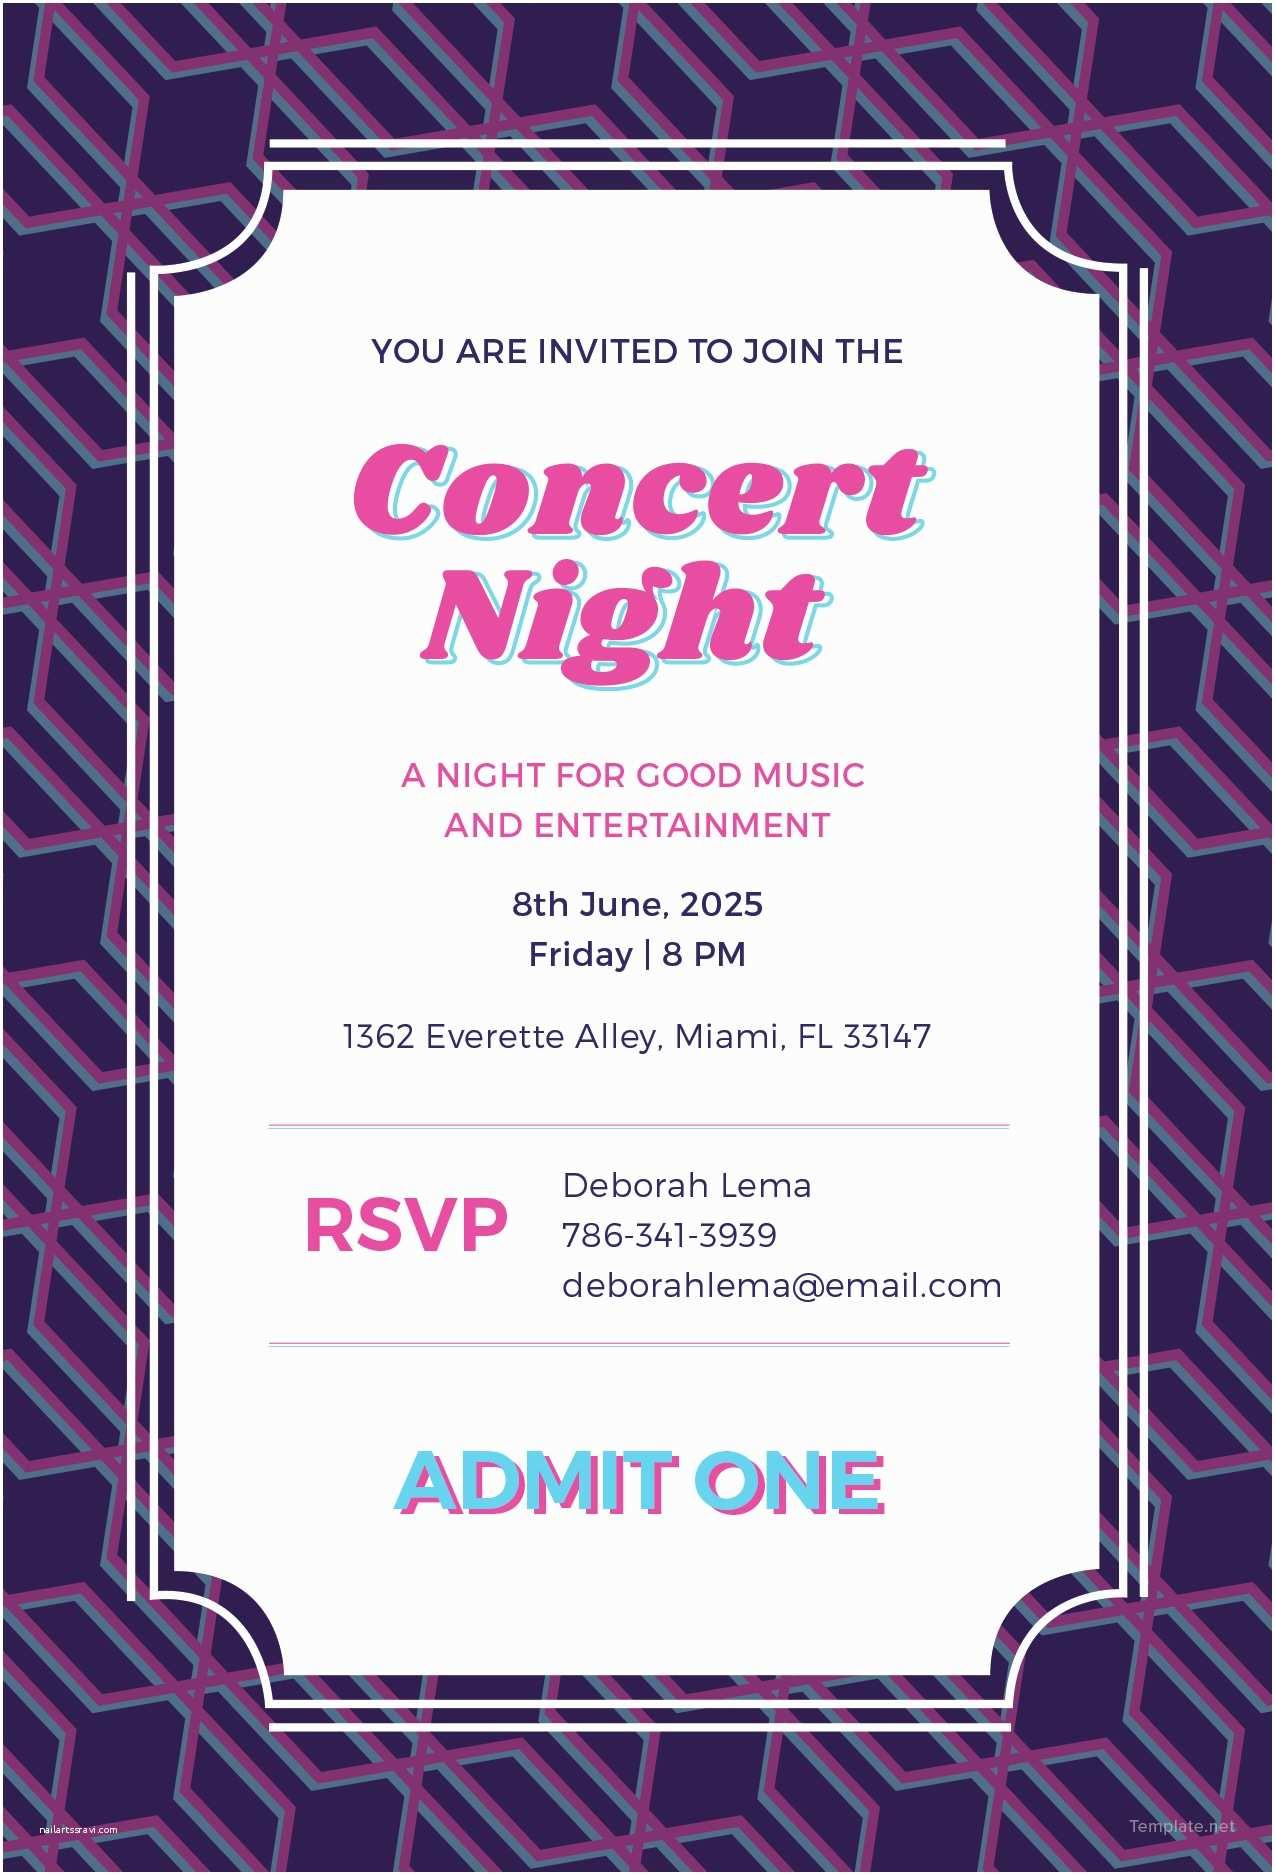 Concert Ticket Wedding Invitation attractive Concert Ticket Invitations Template